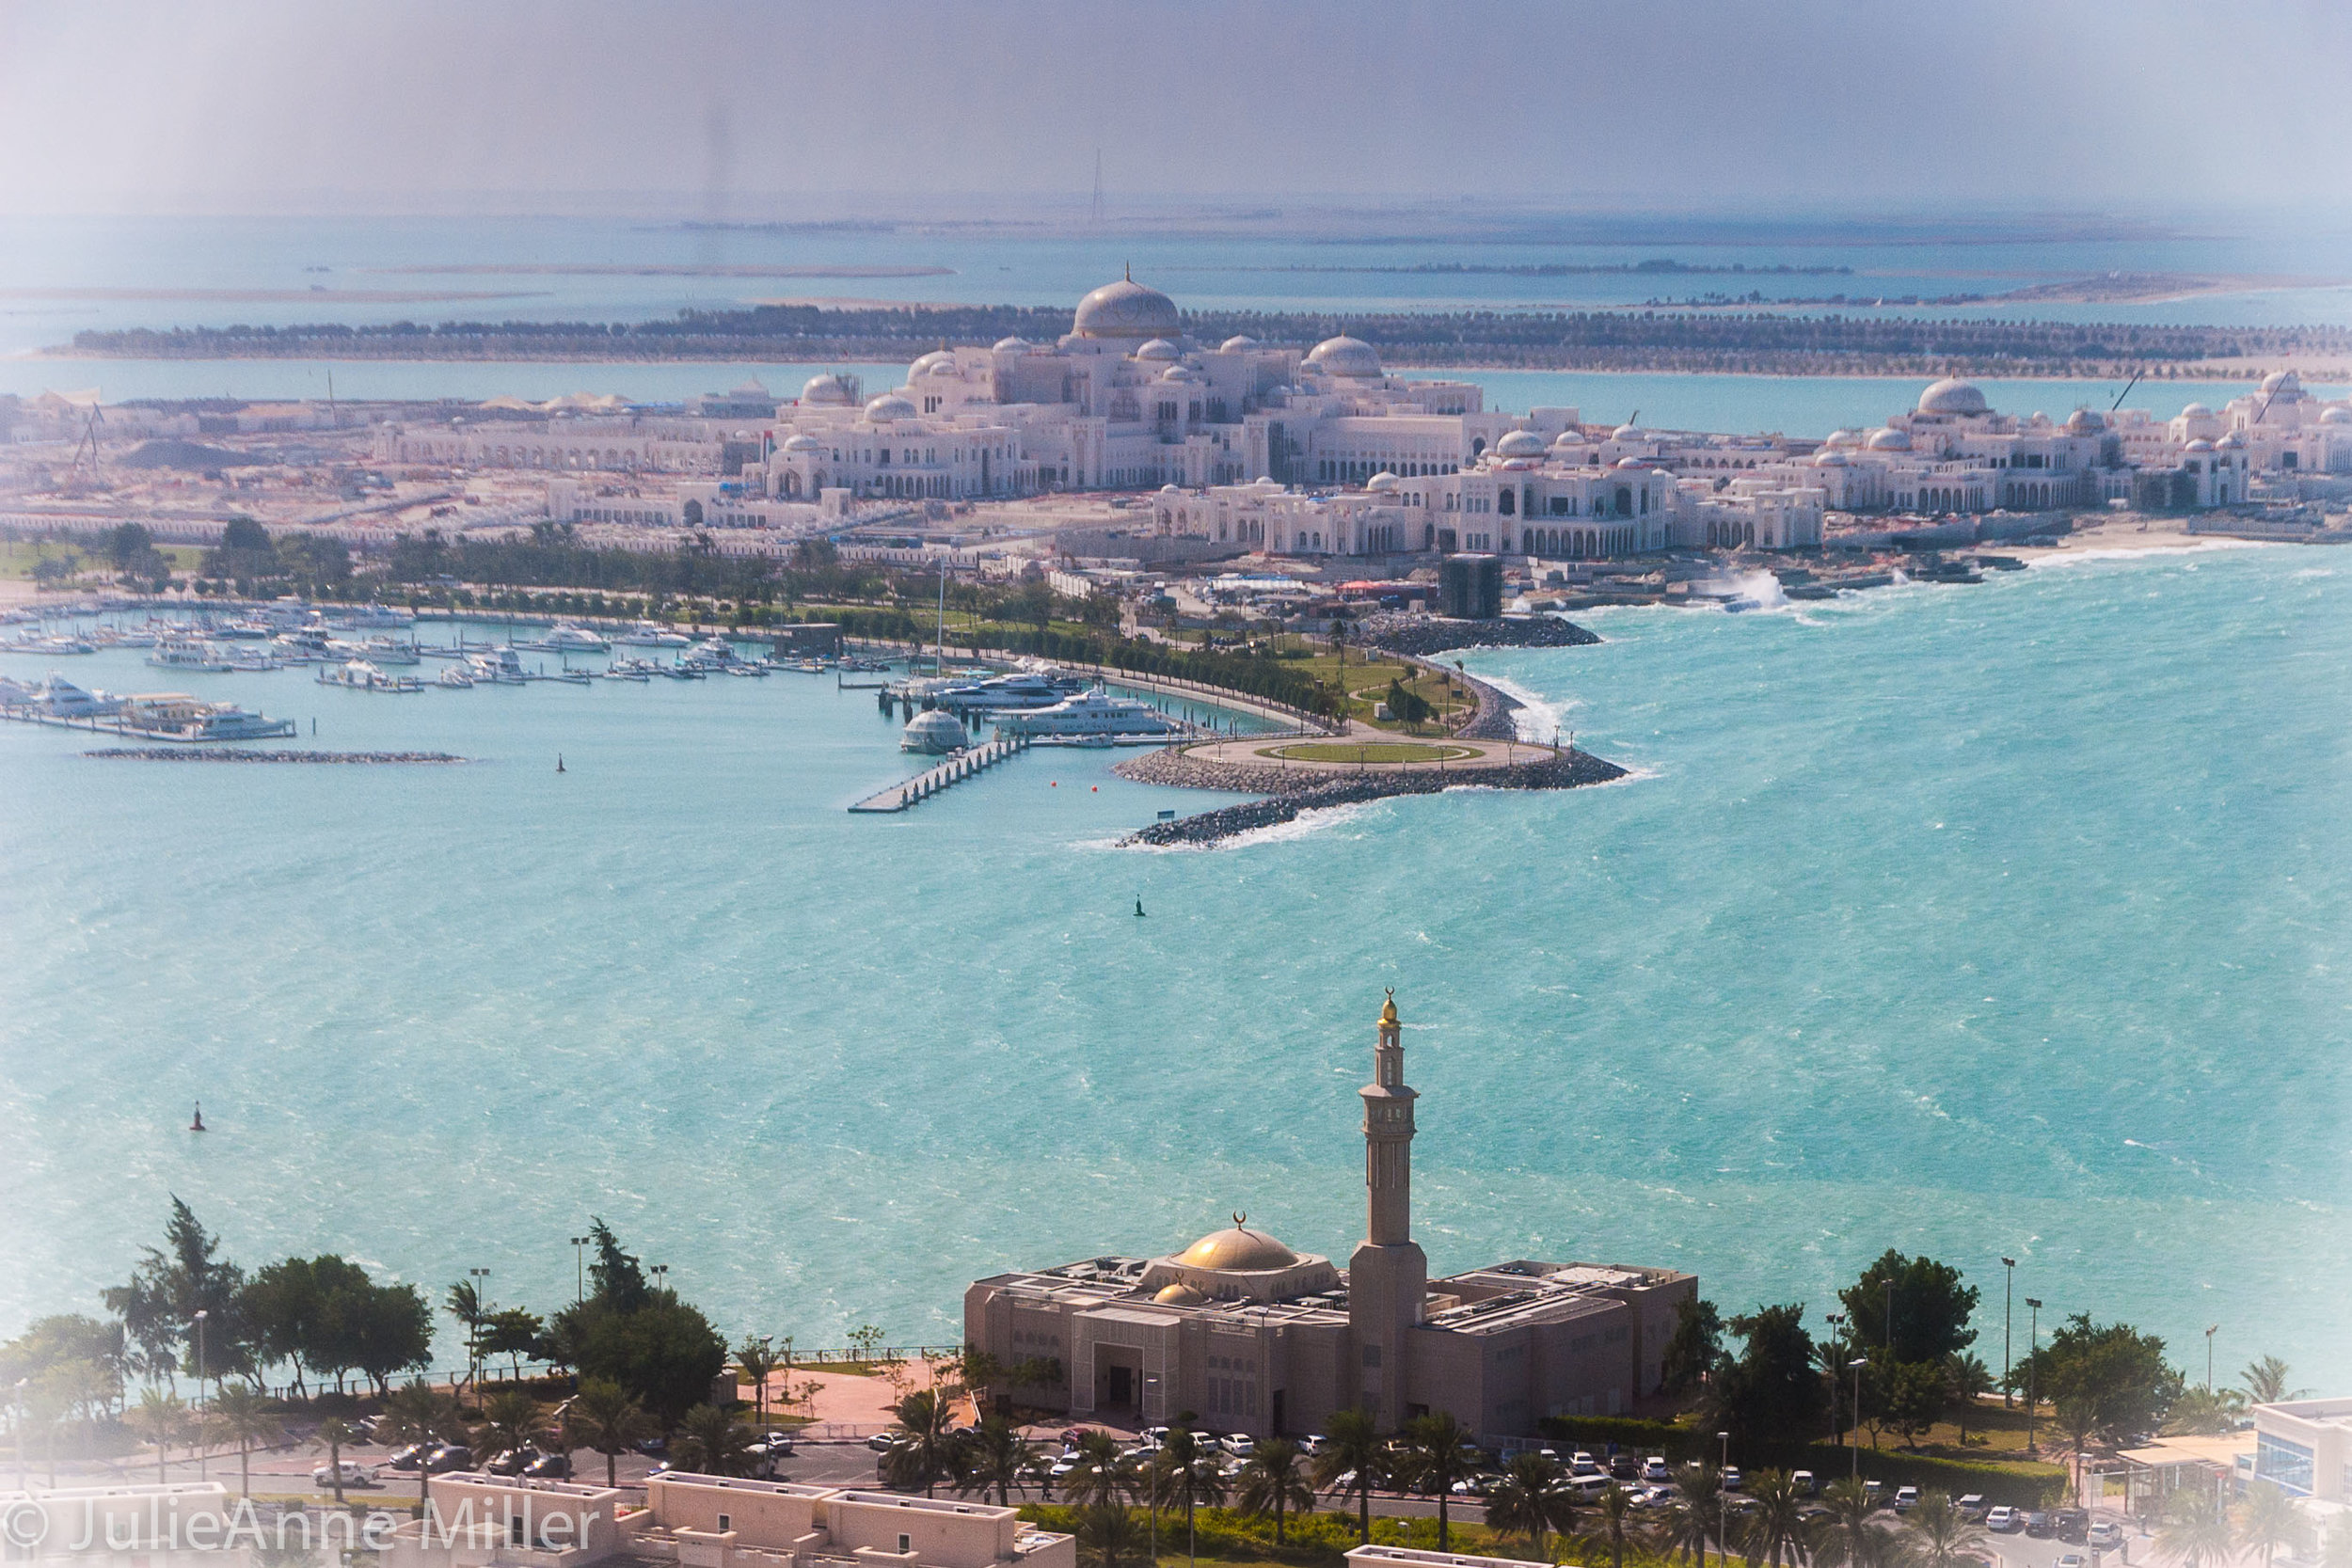 Mosque, Abu Dhabi, UAE